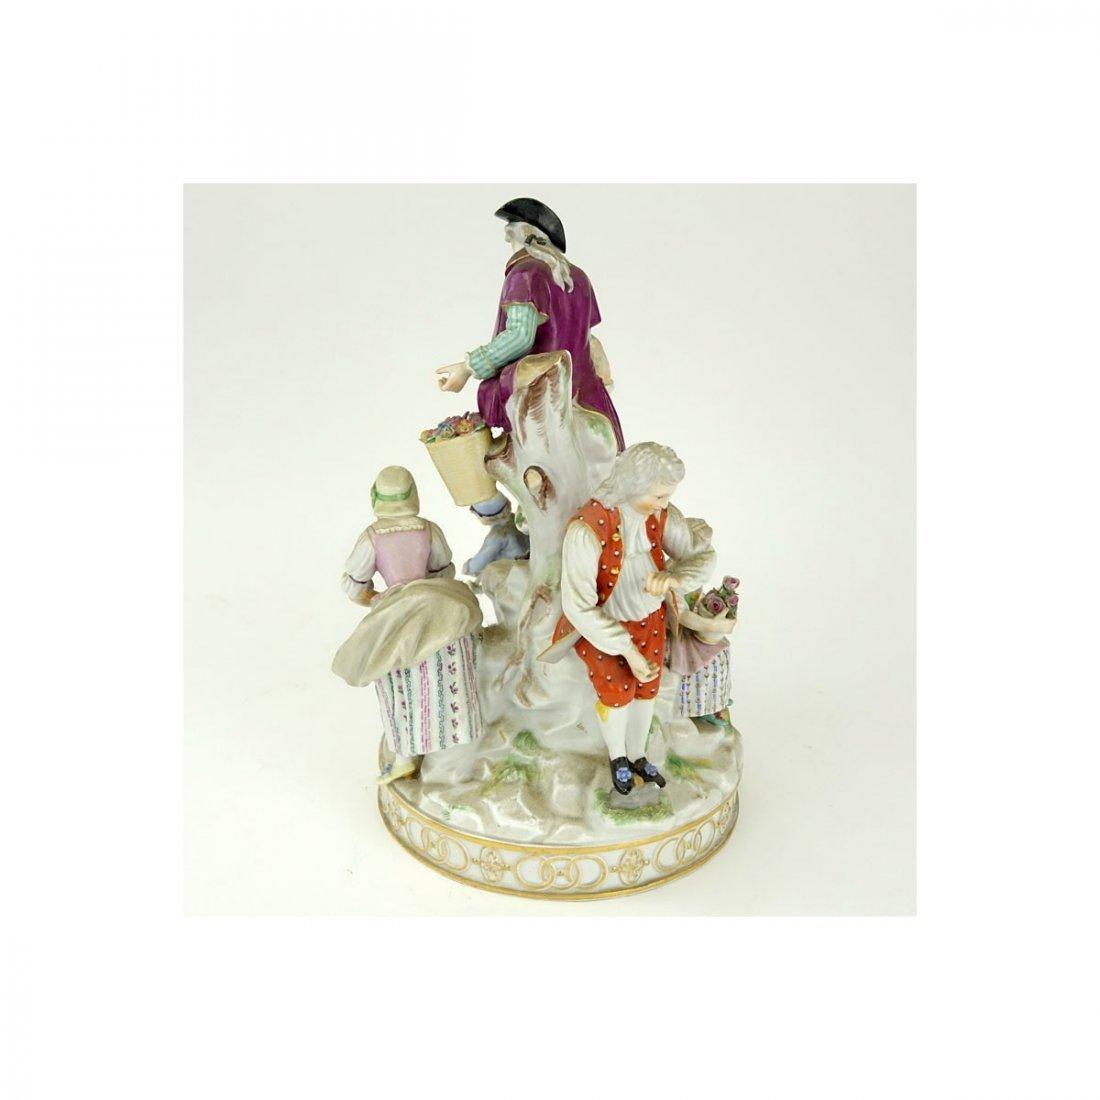 19th Century Meissen Hand Painted Porcelain Figural - 5